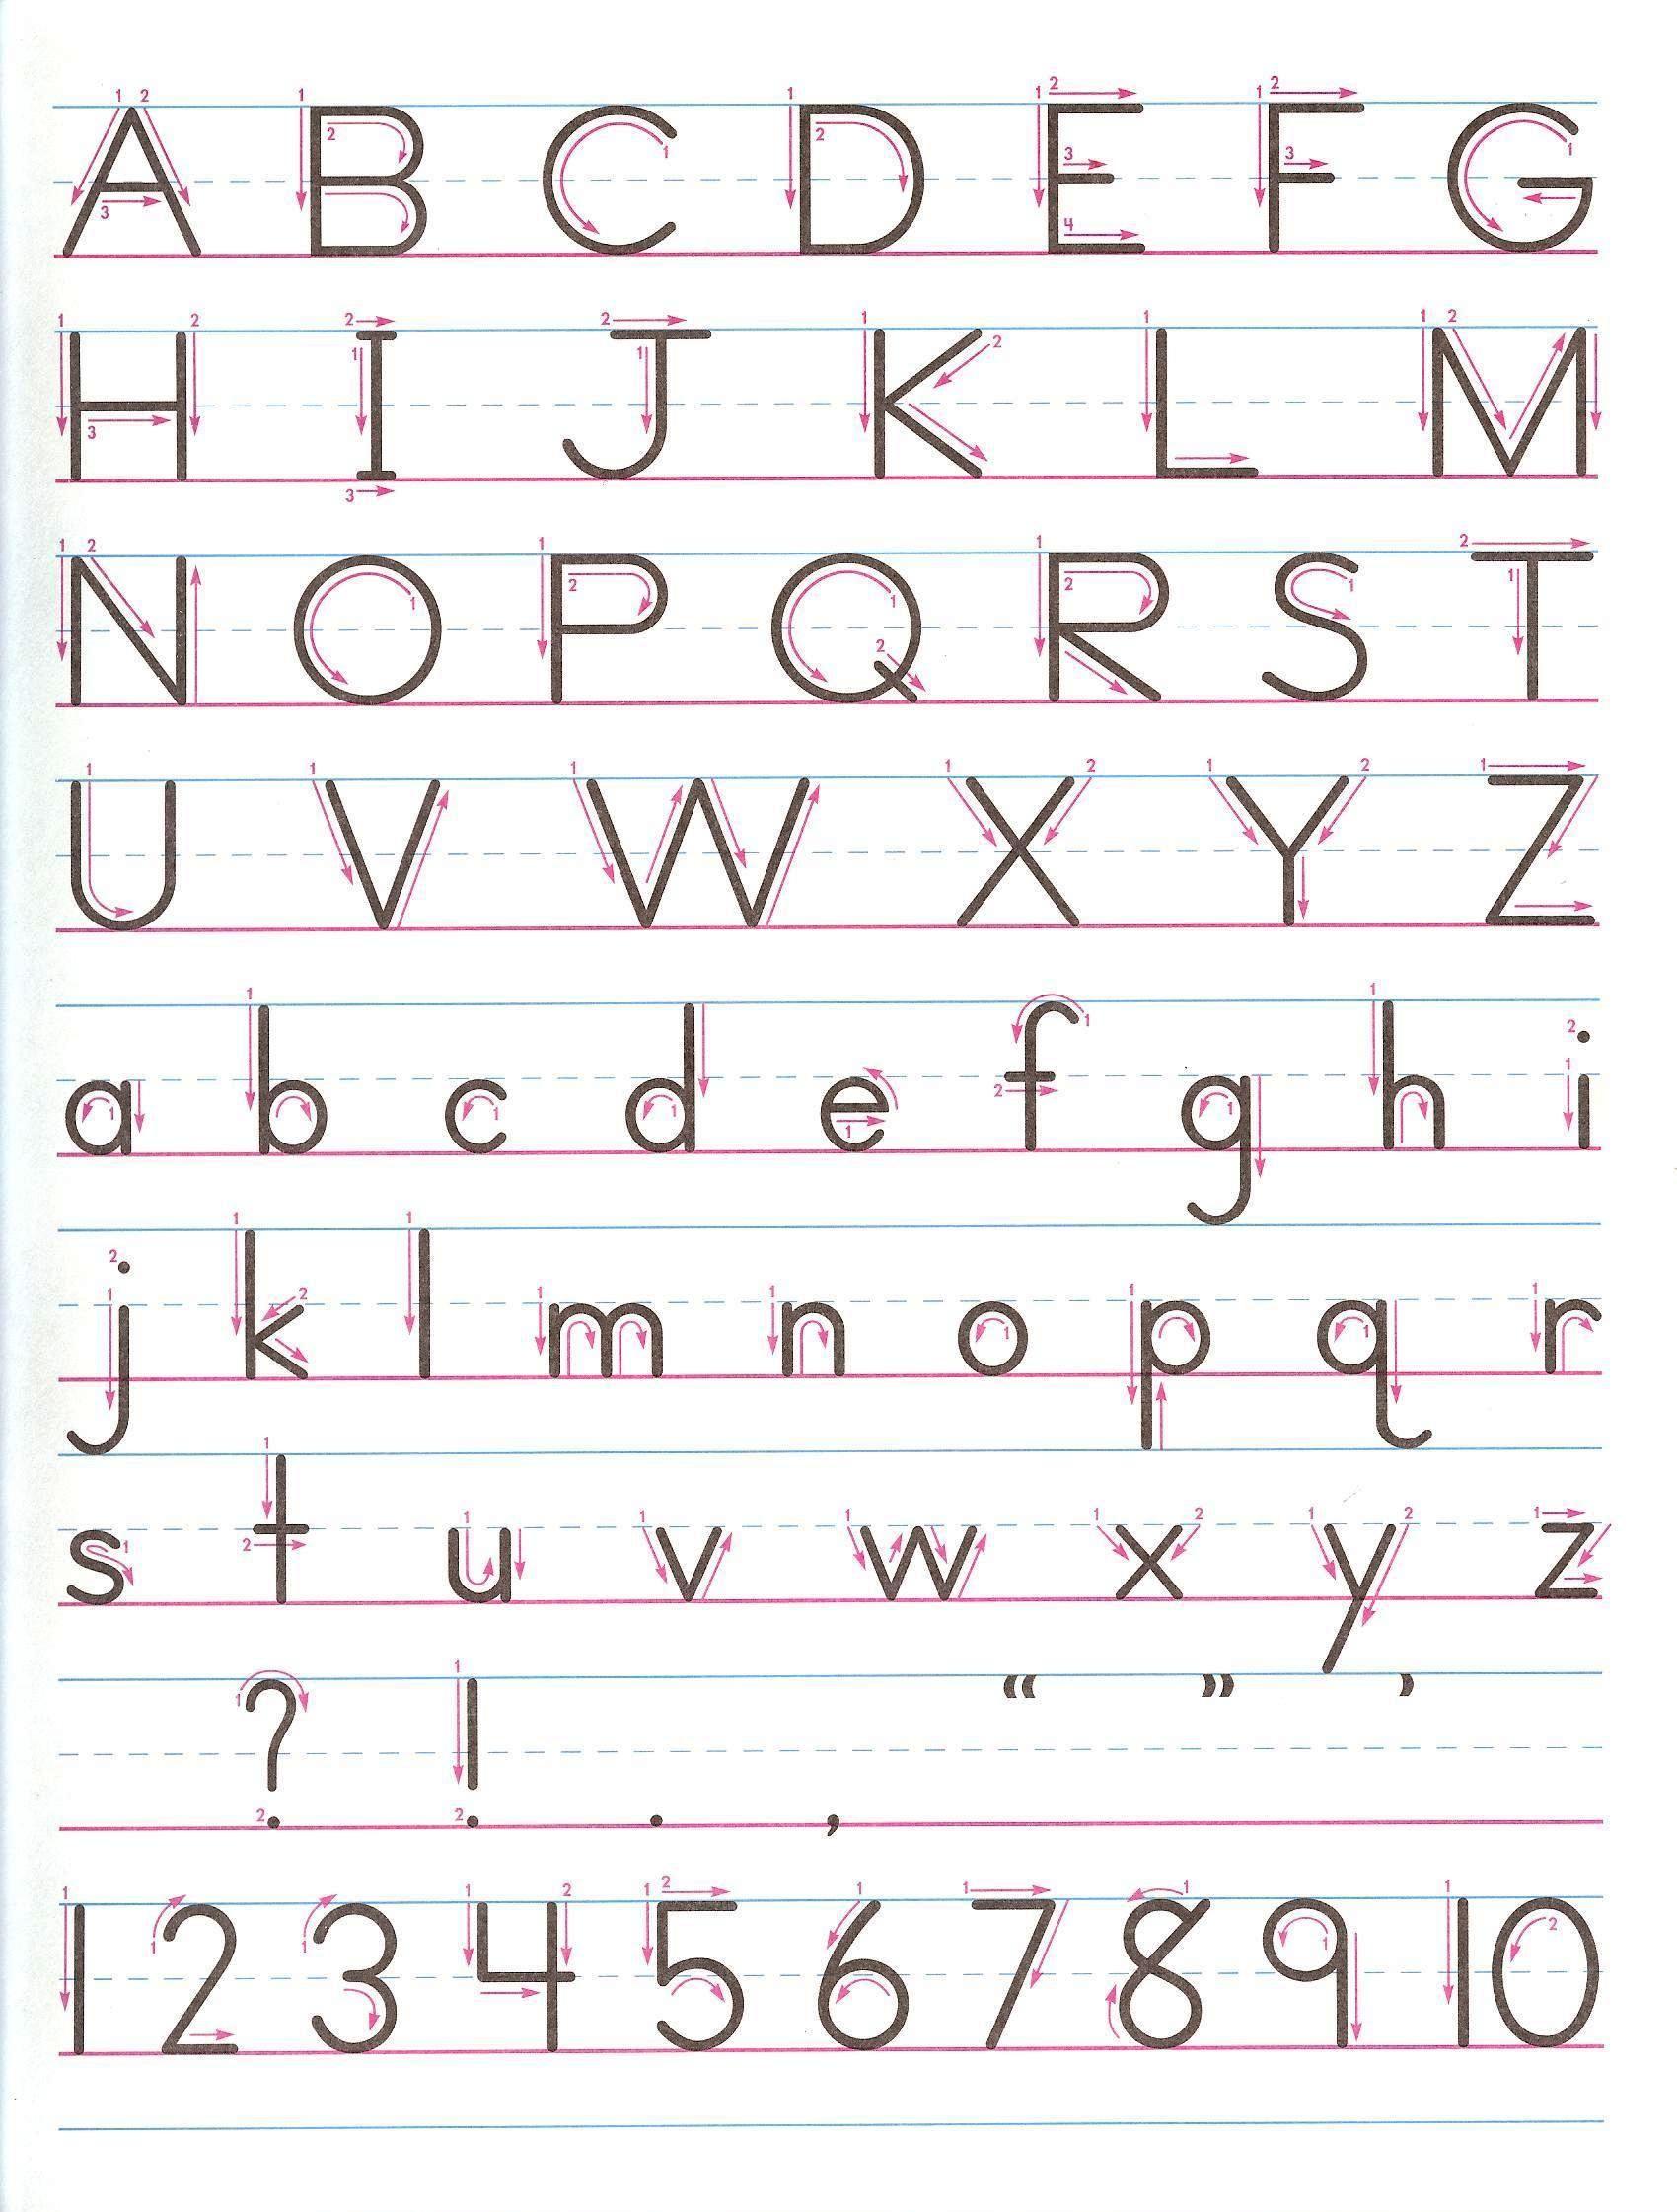 Zaner bloser handwriting chart printable manuscriptg also manuscript rh pinterest